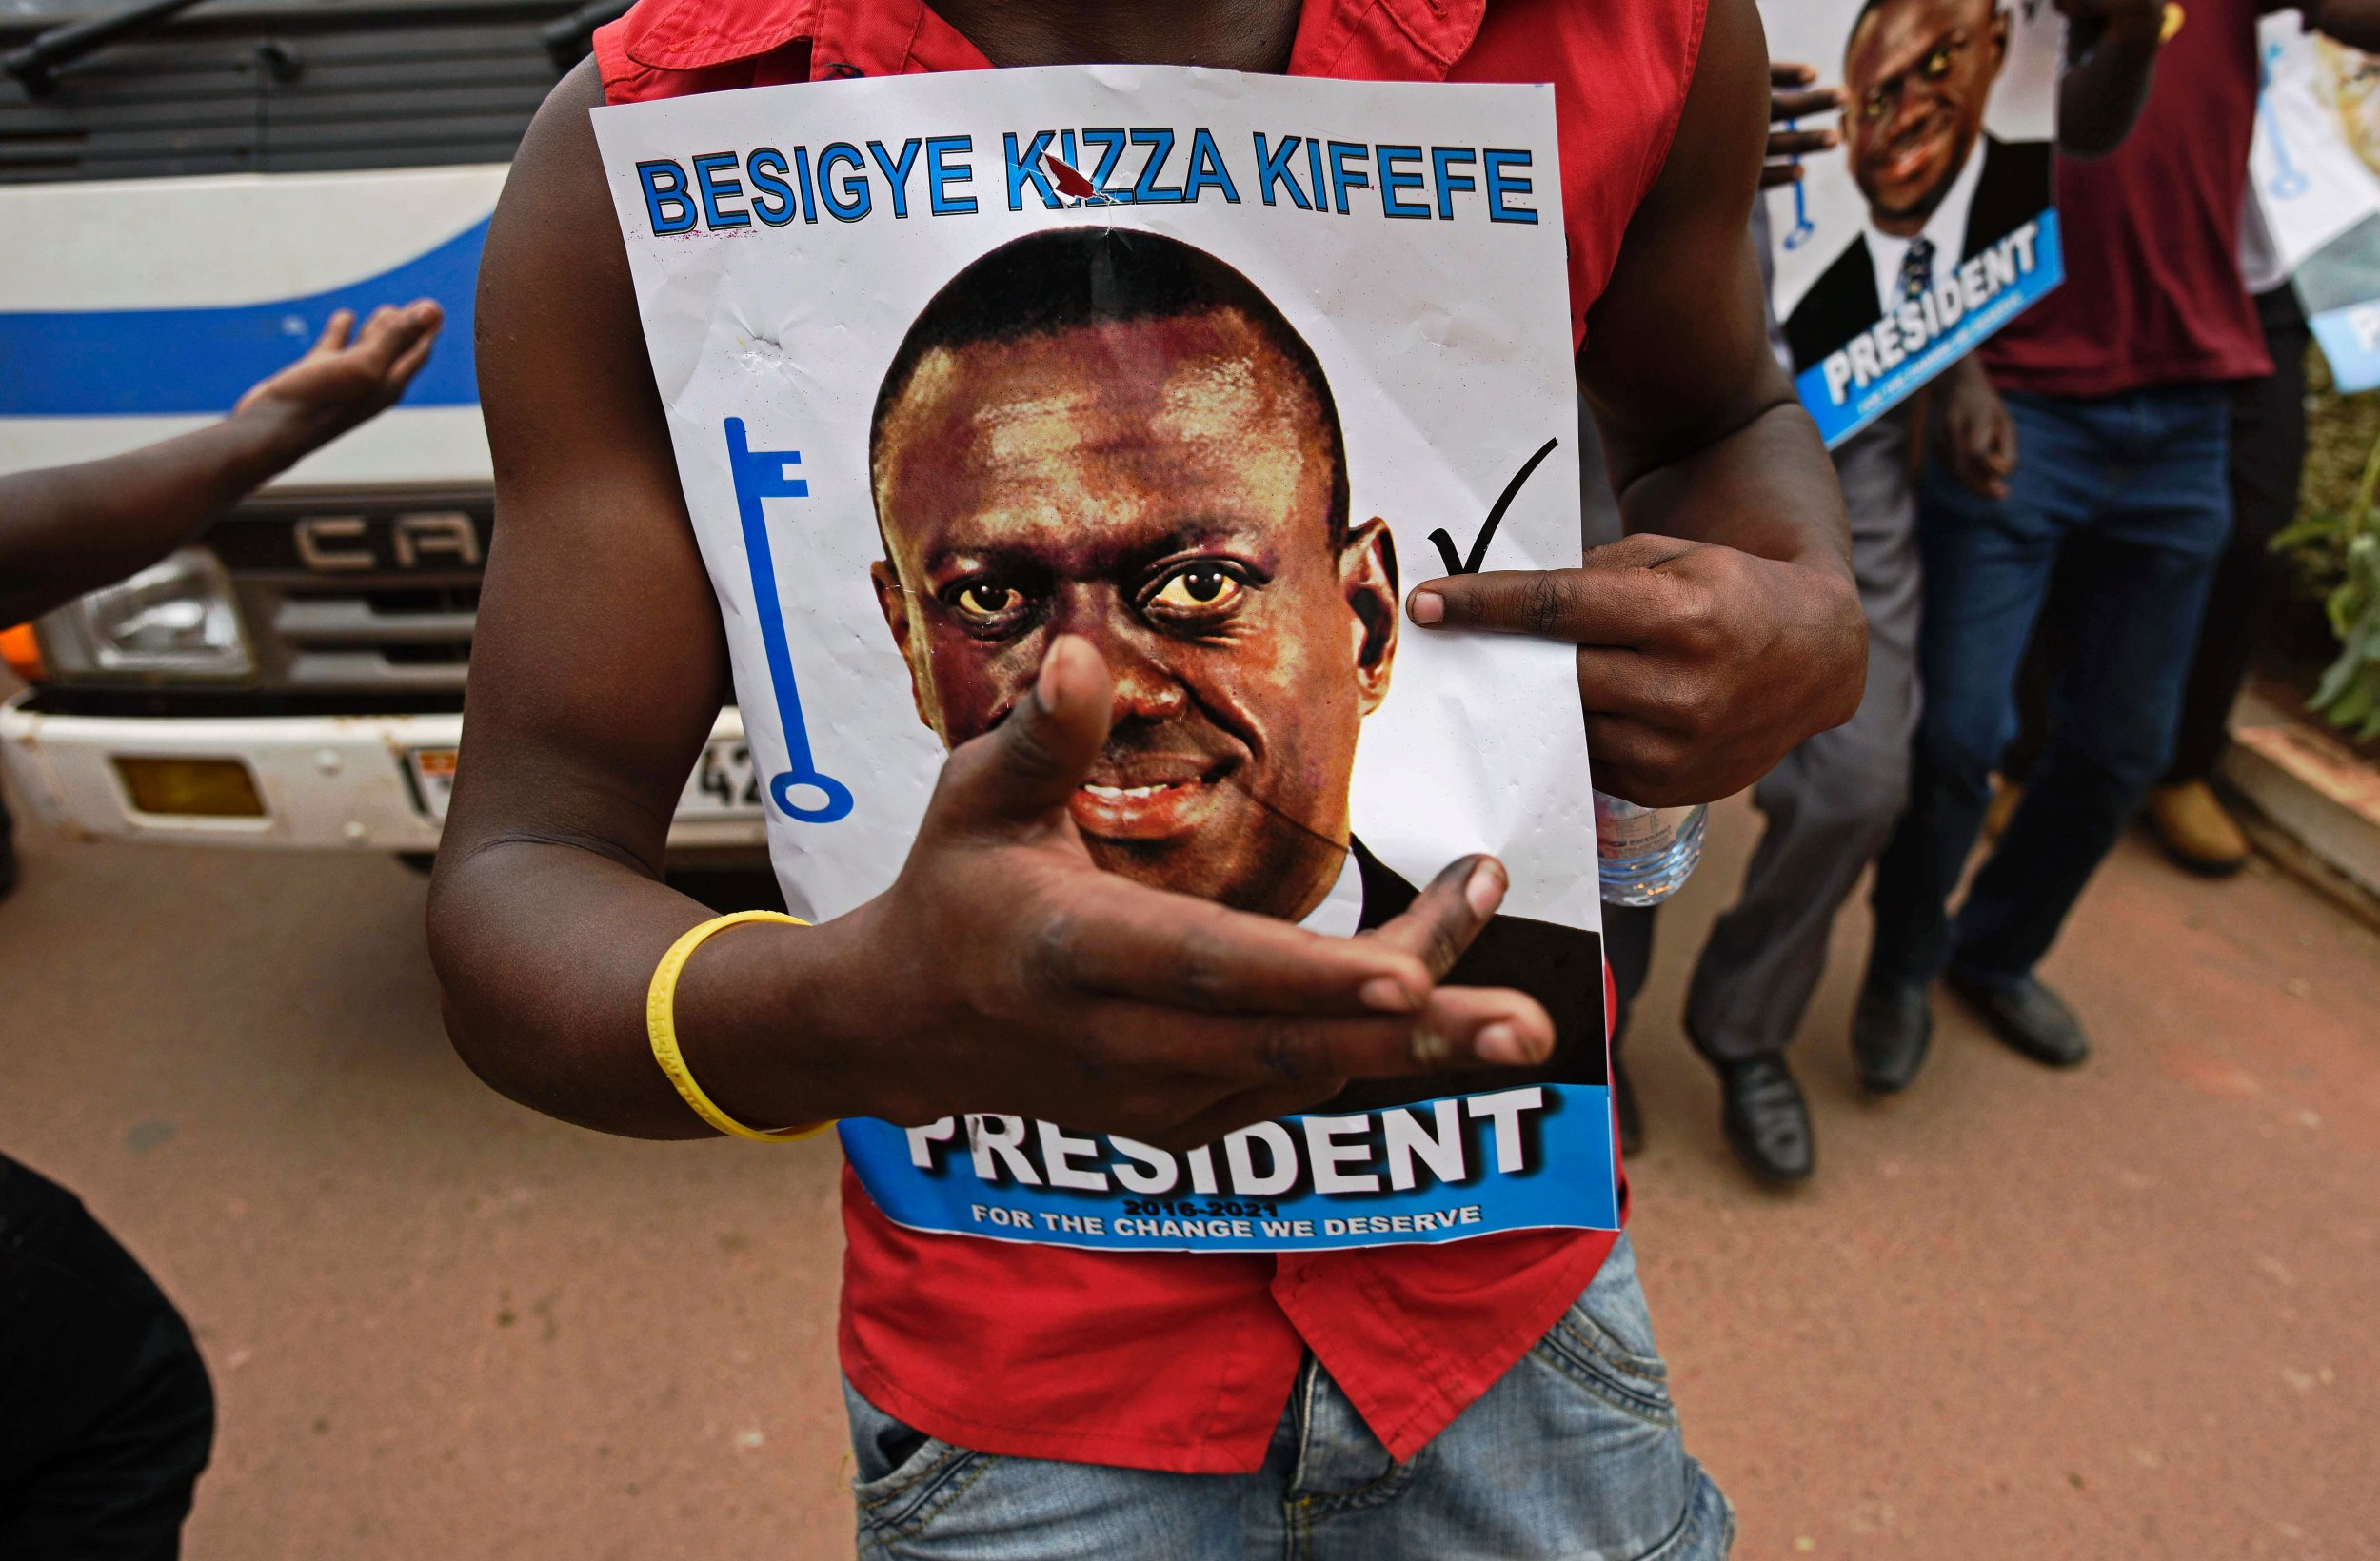 A Kizza Besigye supporter in Kampala, Uganda.